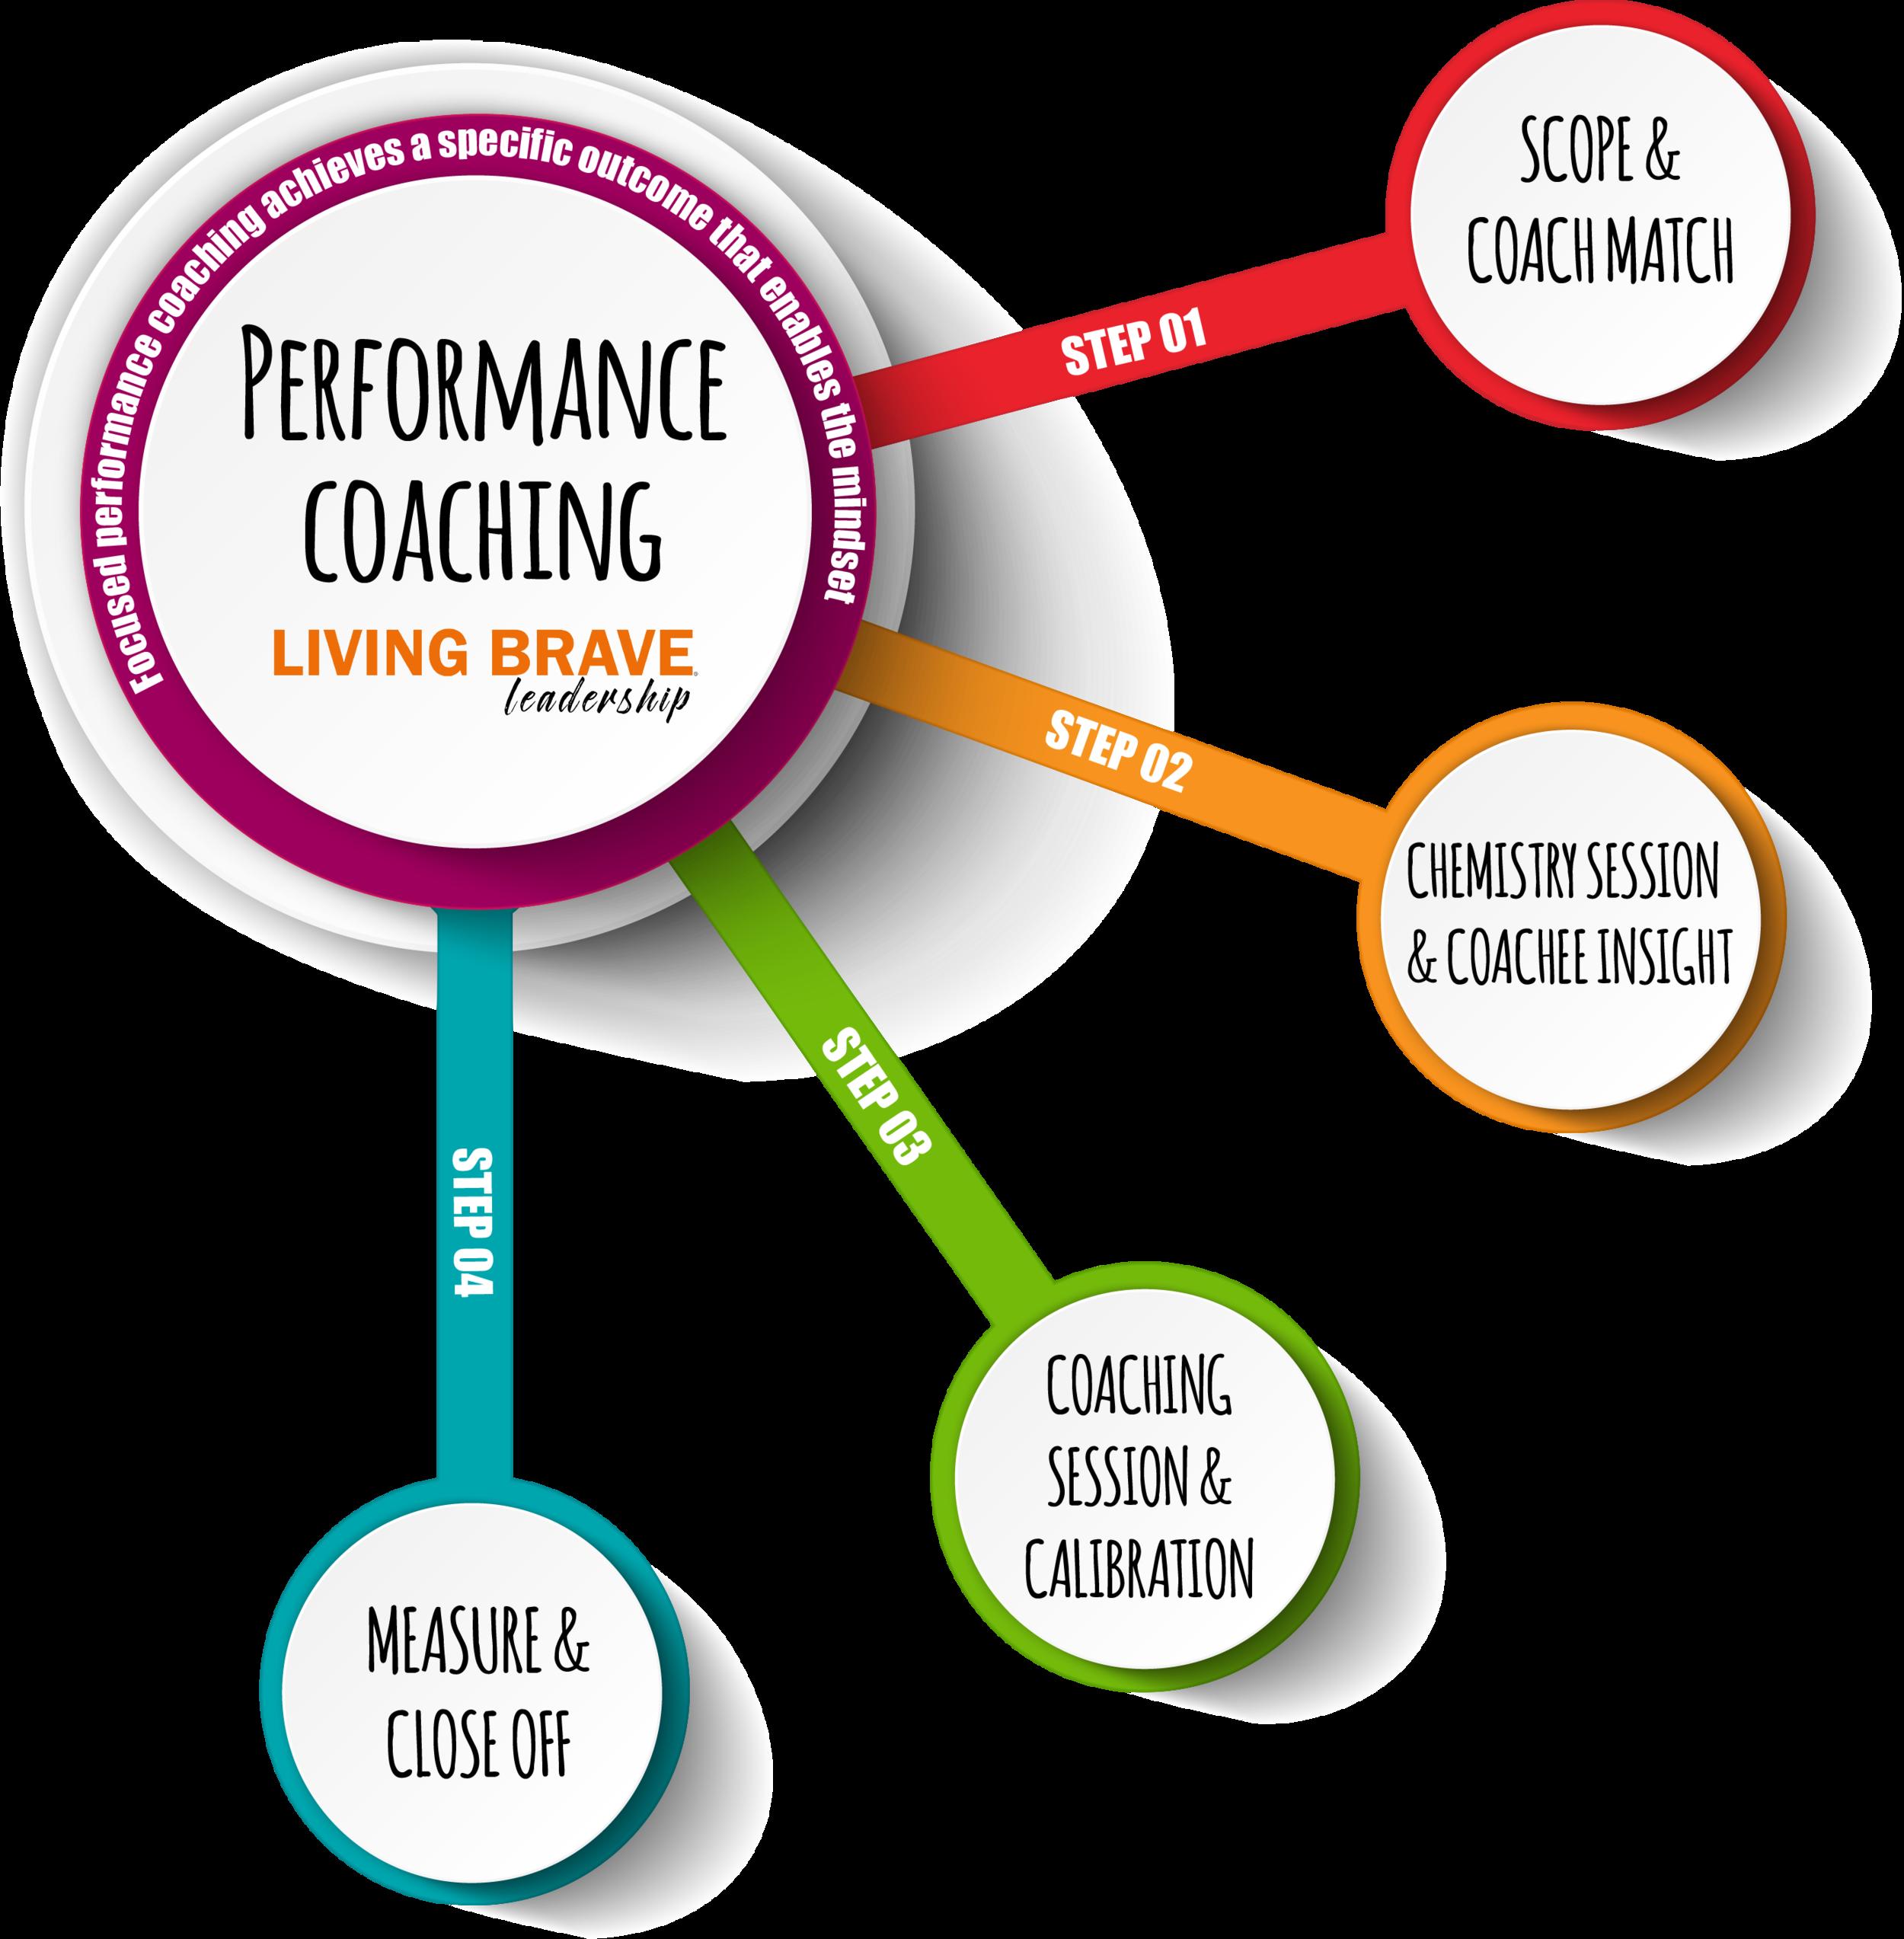 Performance Coaching - Living Brave